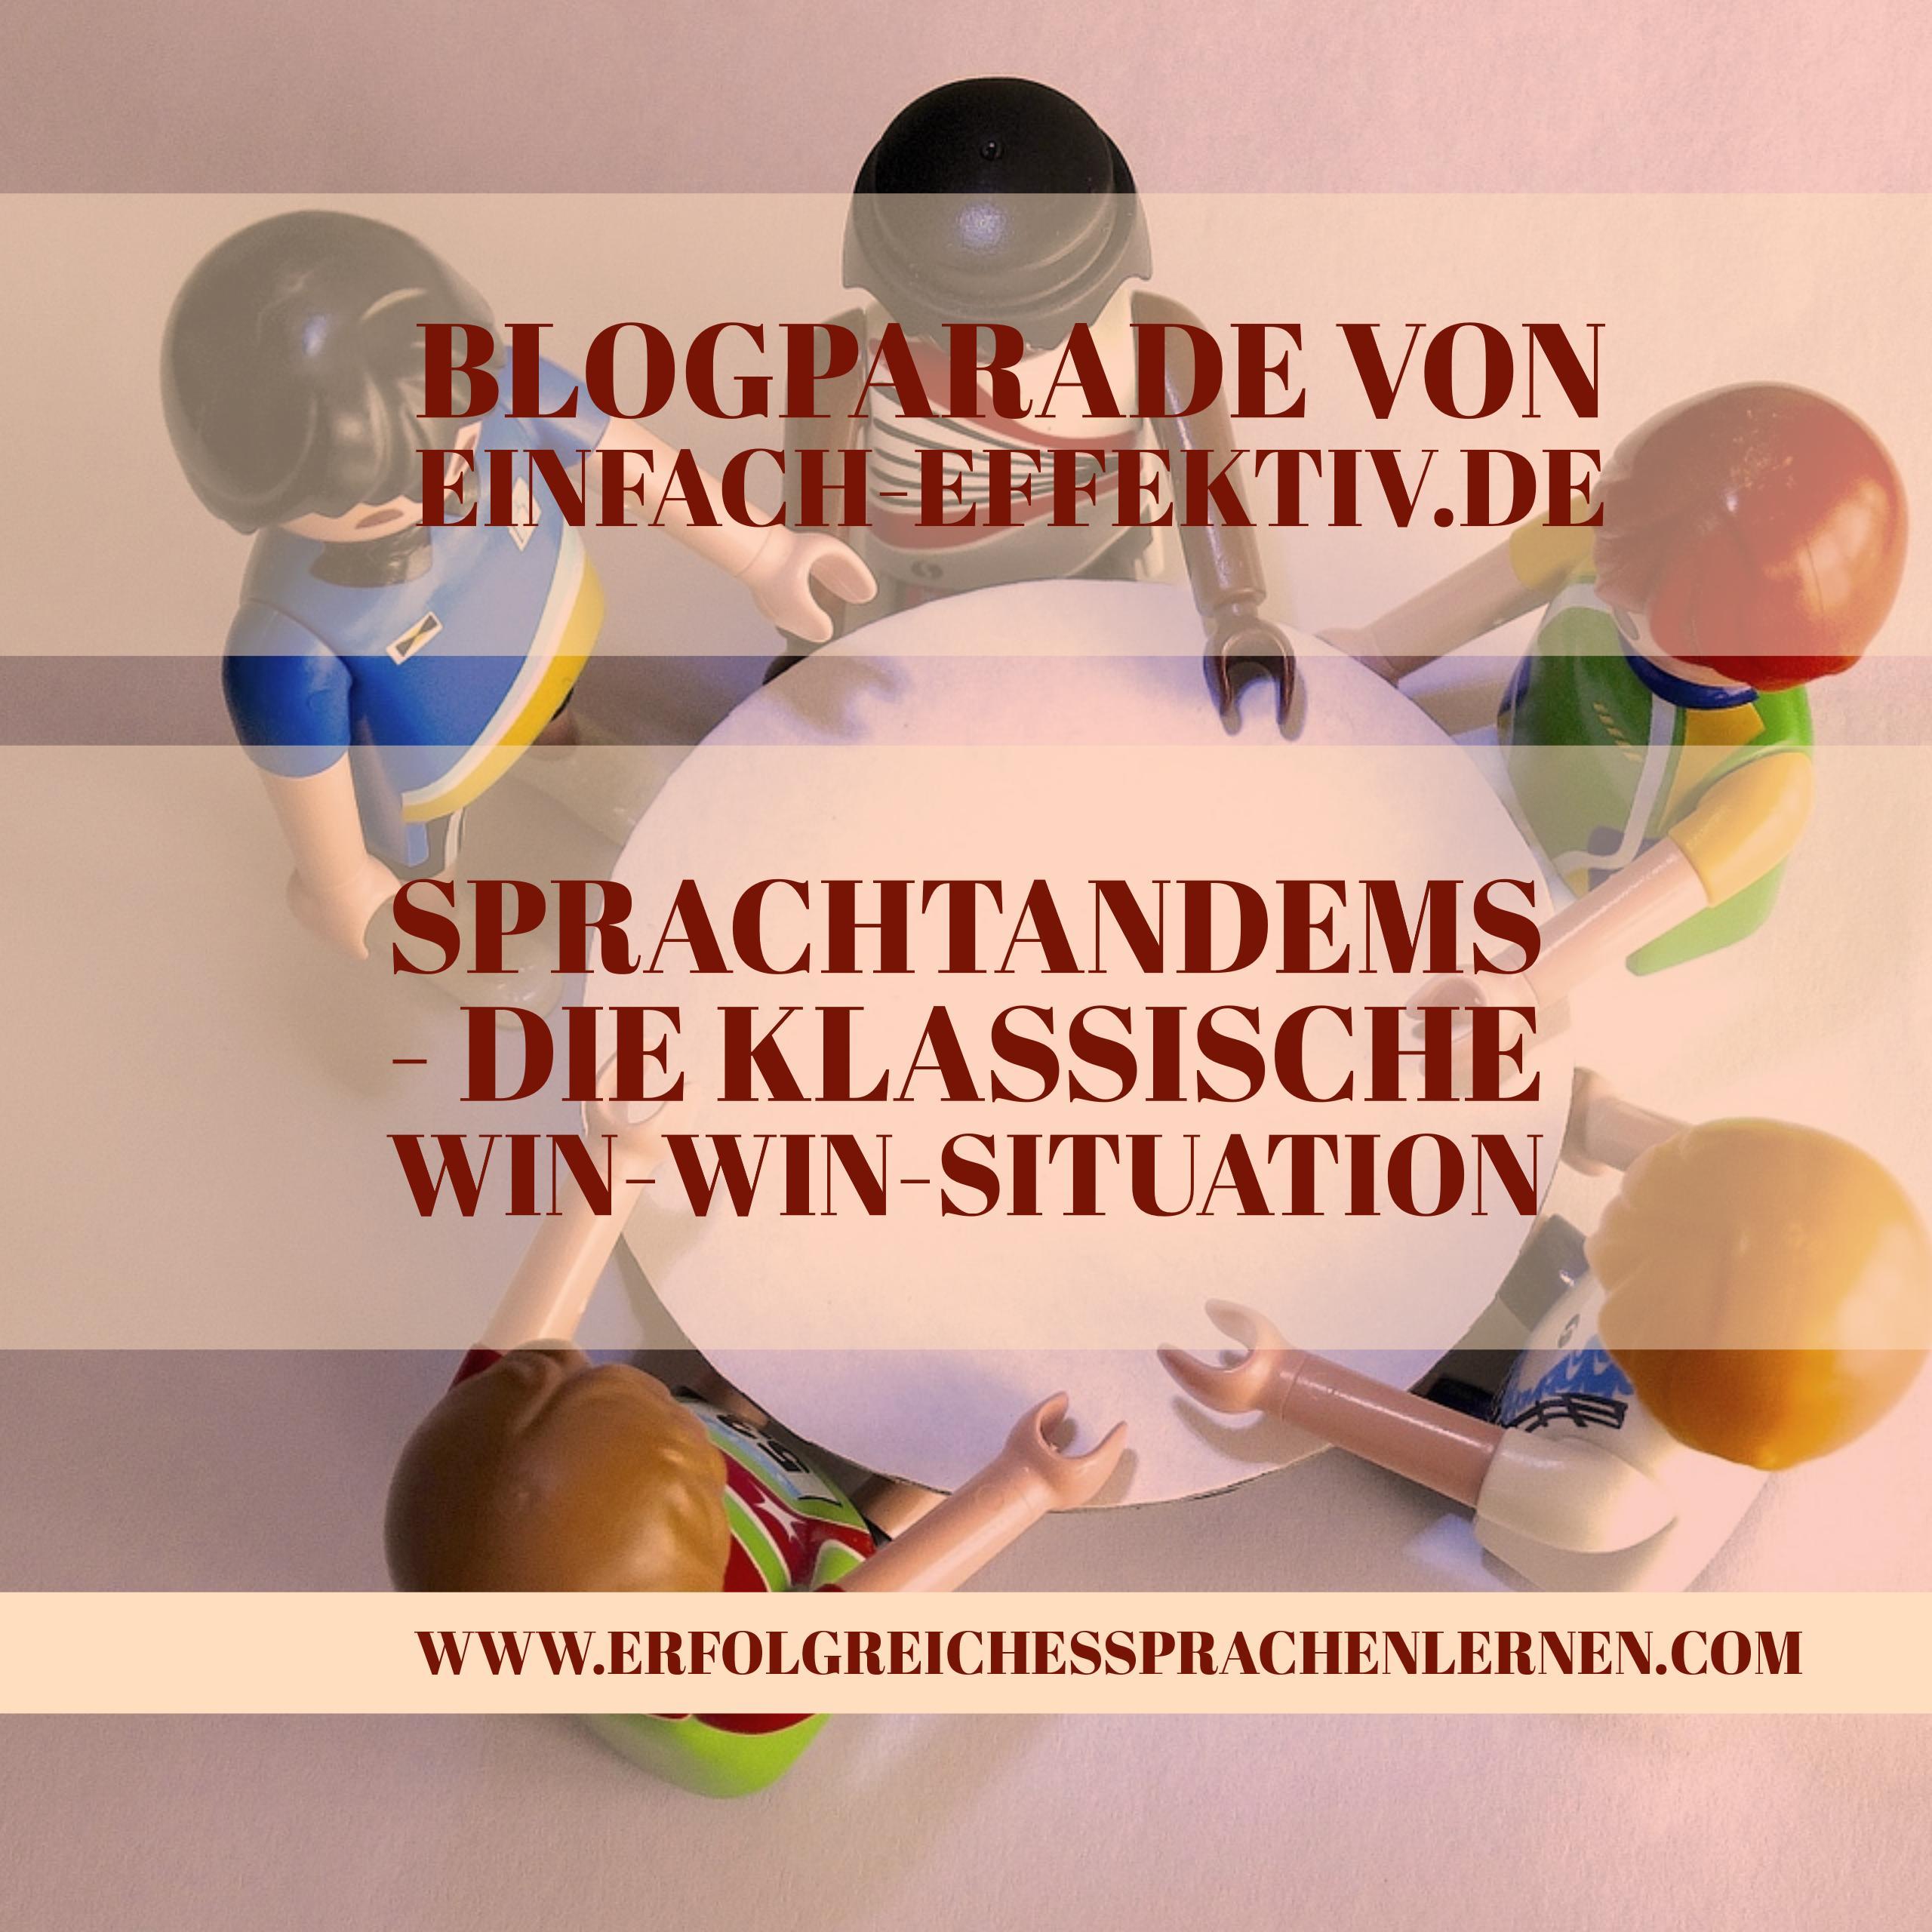 sprachtandem-win-win-situation